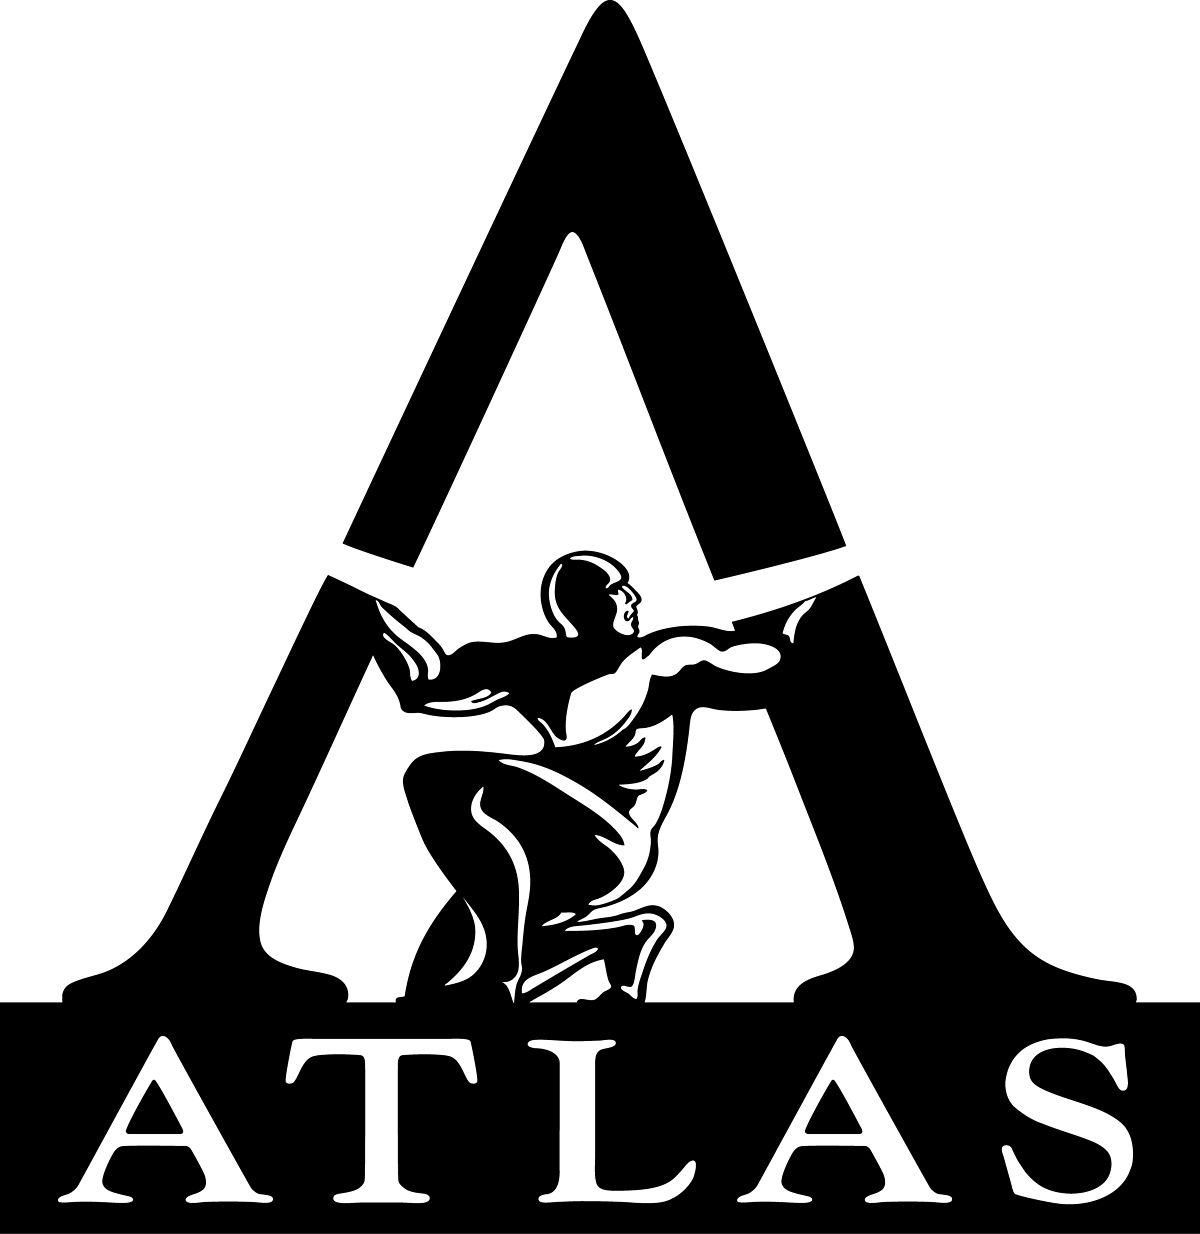 atlas iron wikipedia. Black Bedroom Furniture Sets. Home Design Ideas